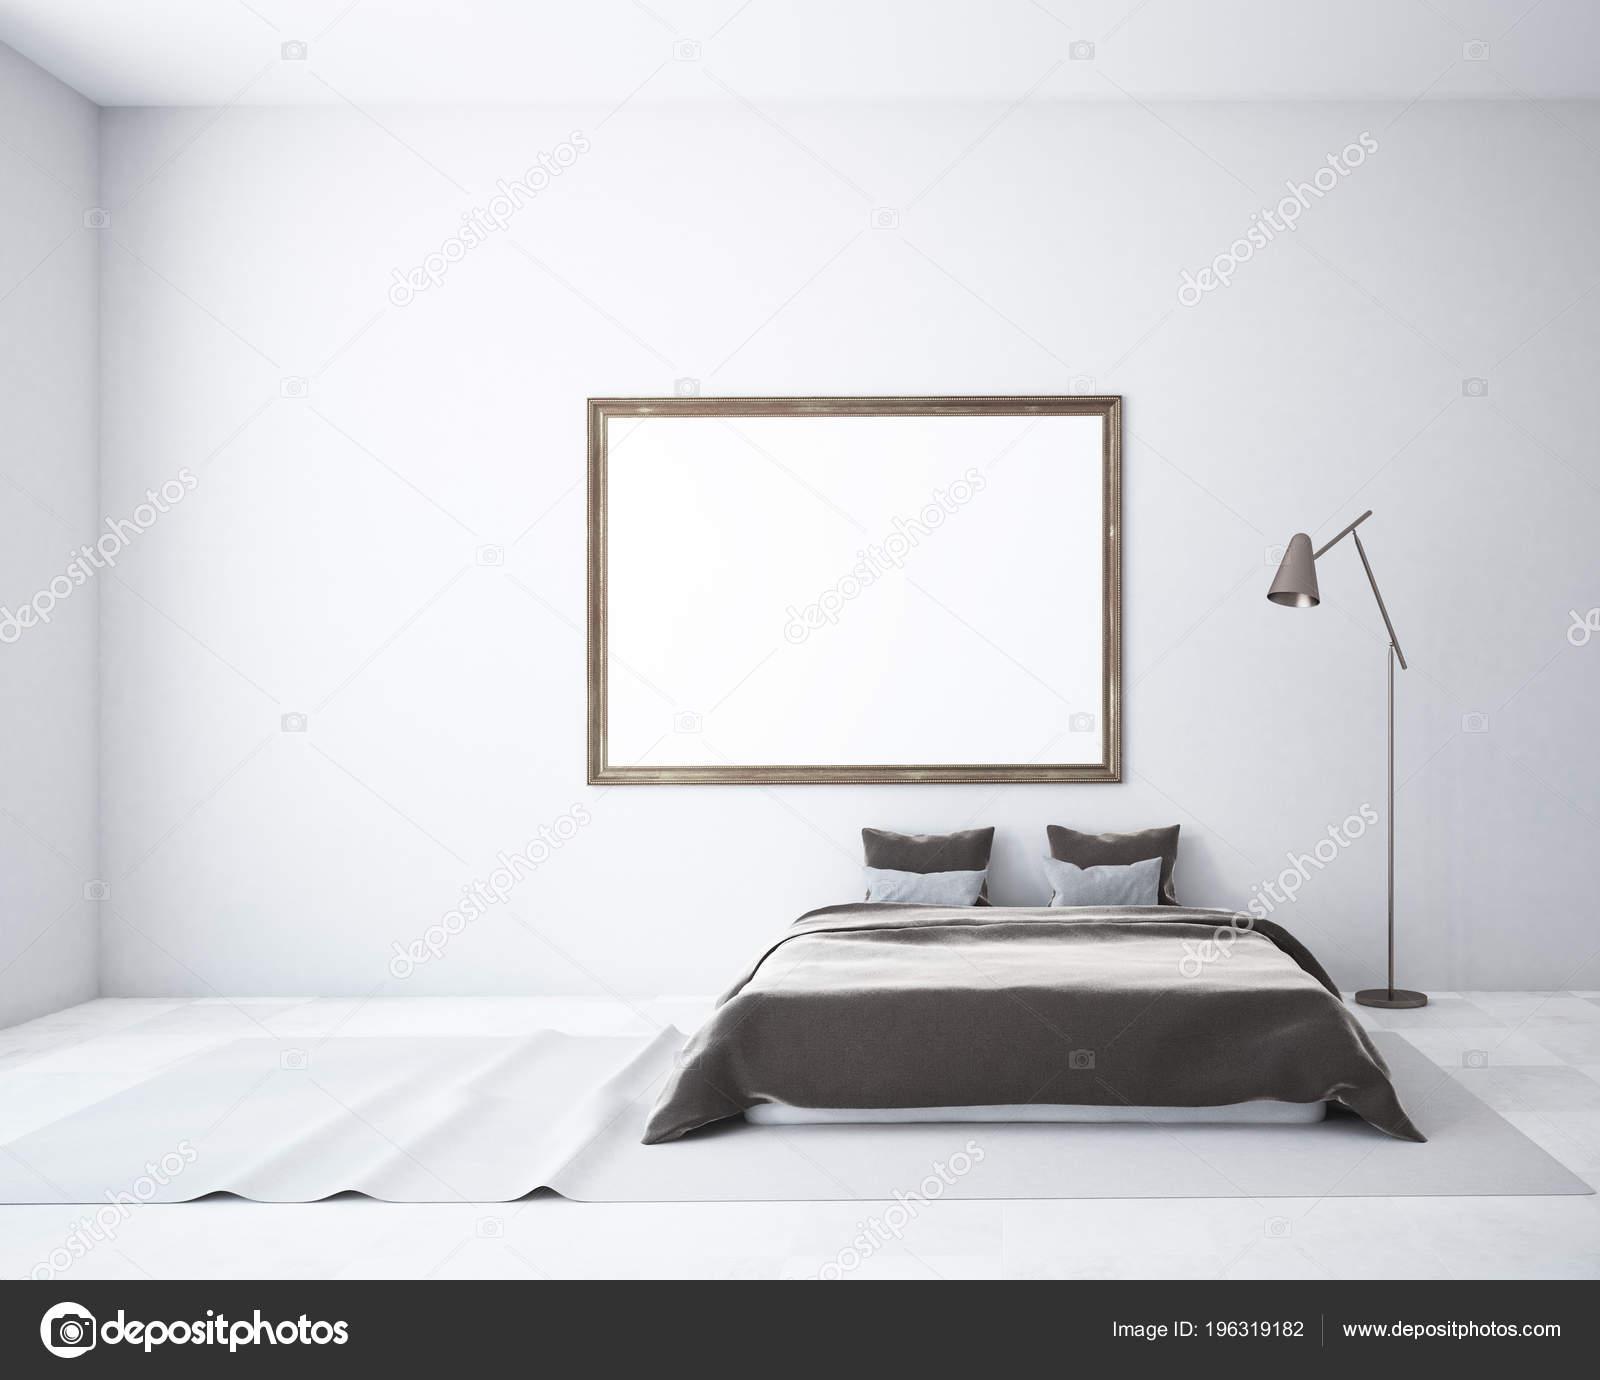 Pictures Bed Frames White Bedroom Interior Rug Floor Double Bed Frame Horizontal Poster Stock Photo C Denisismagilov 196319182